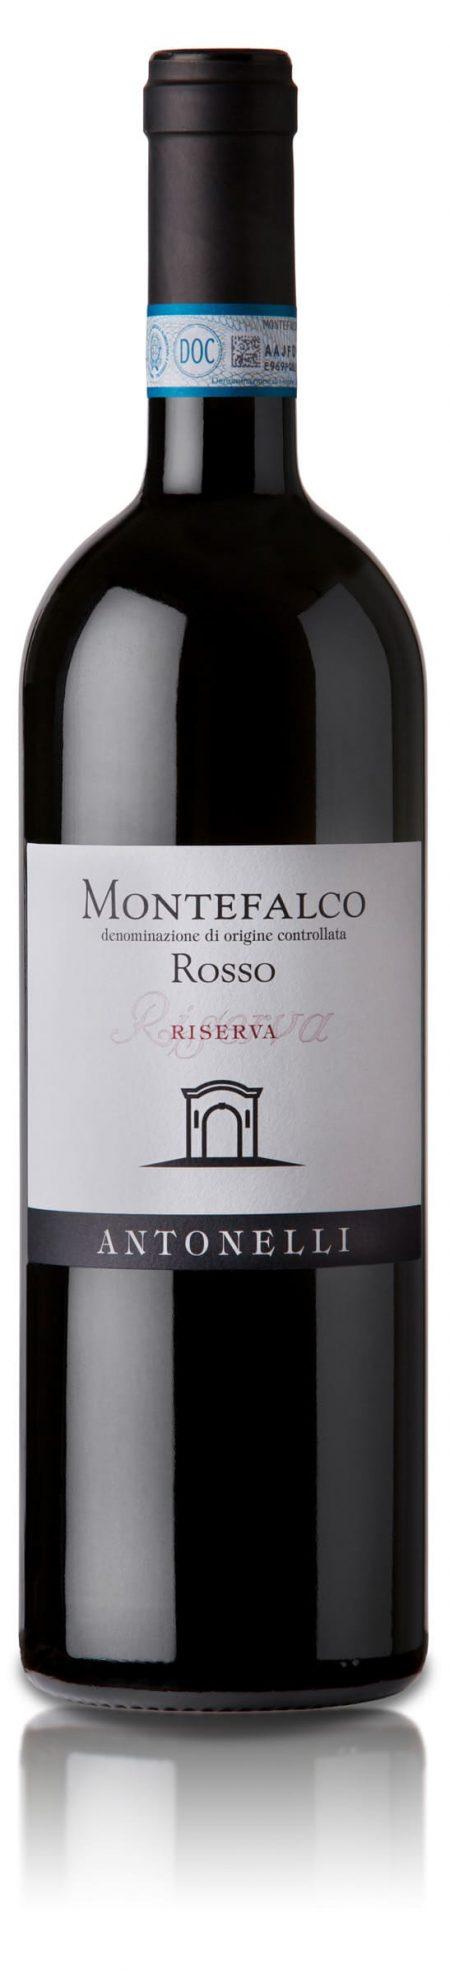 Montefalco Rosso Antonelli